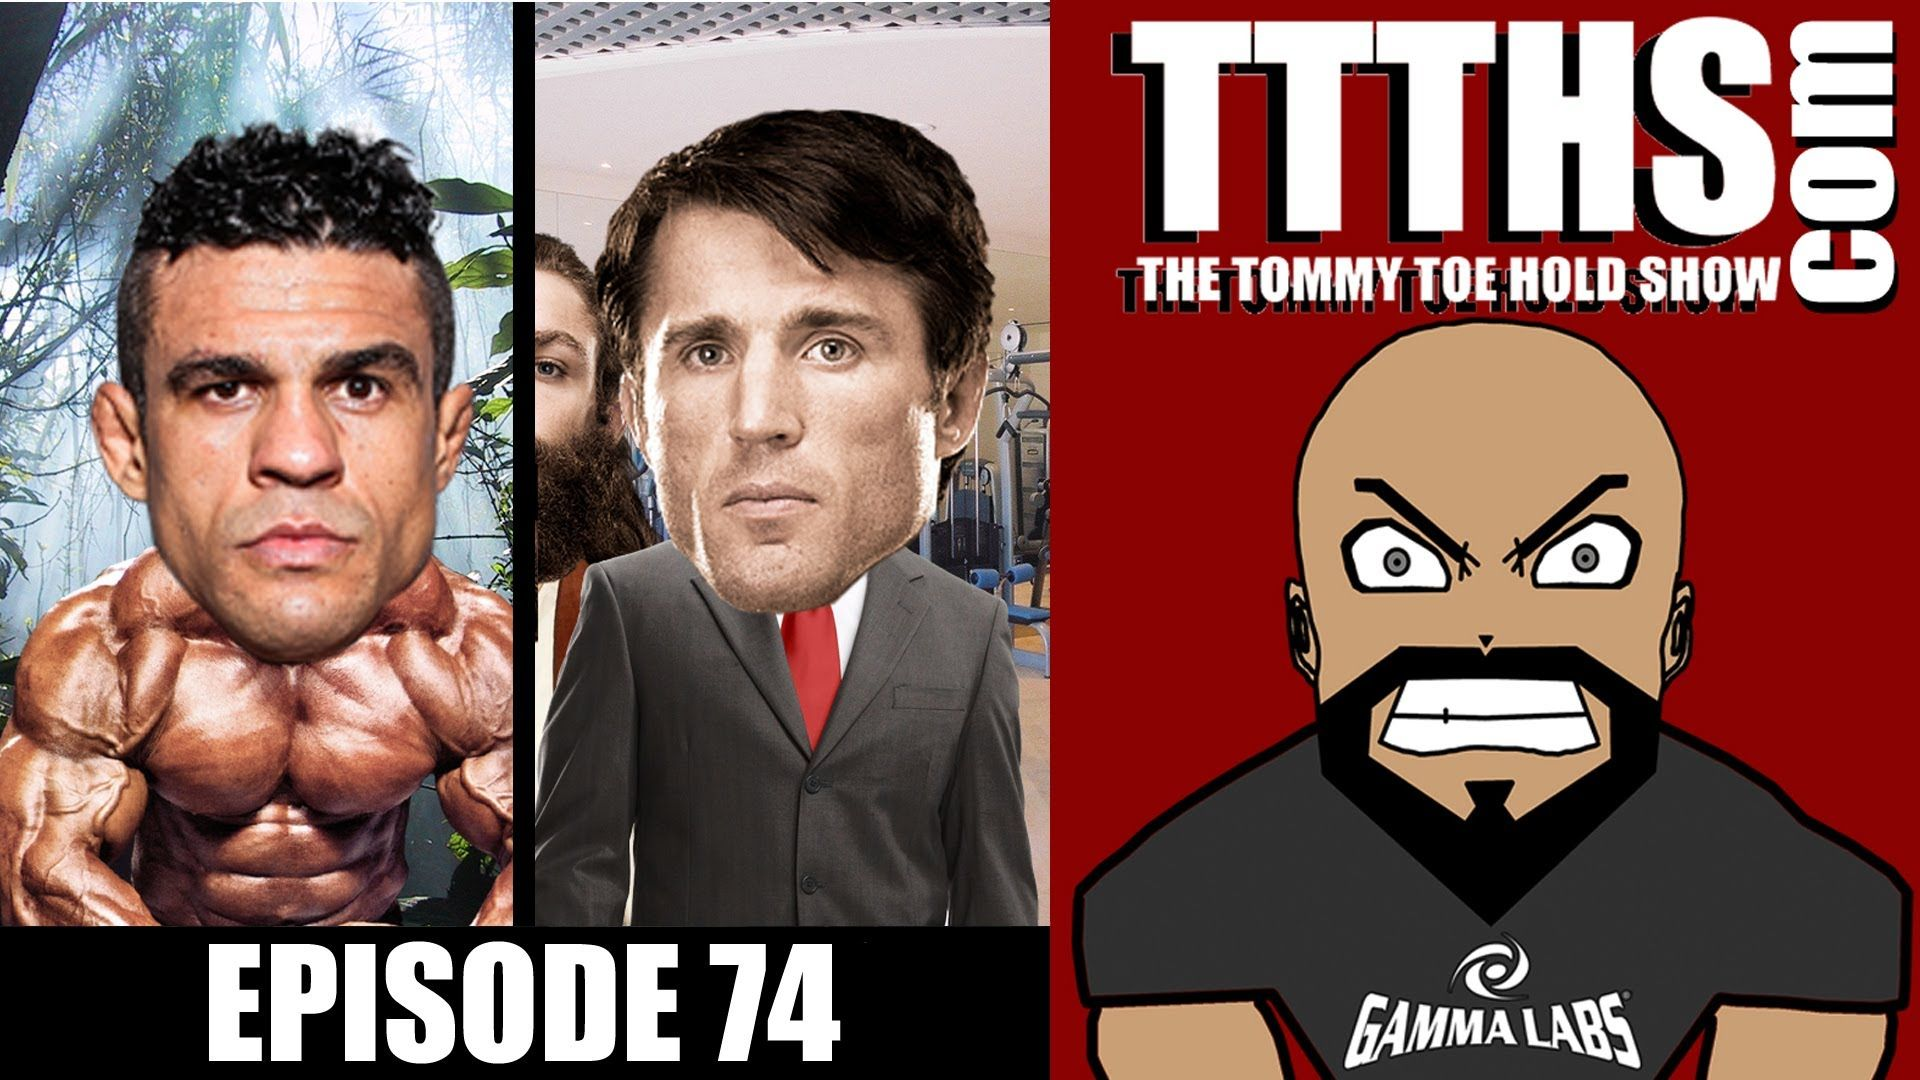 The Tommy Toe Hold Show: Episode 74 - VITOR VS CHAEL FOR A TITLE SHOT!?!?!? #TTTHS #McDojo www.Facebook.com/McDojoLife